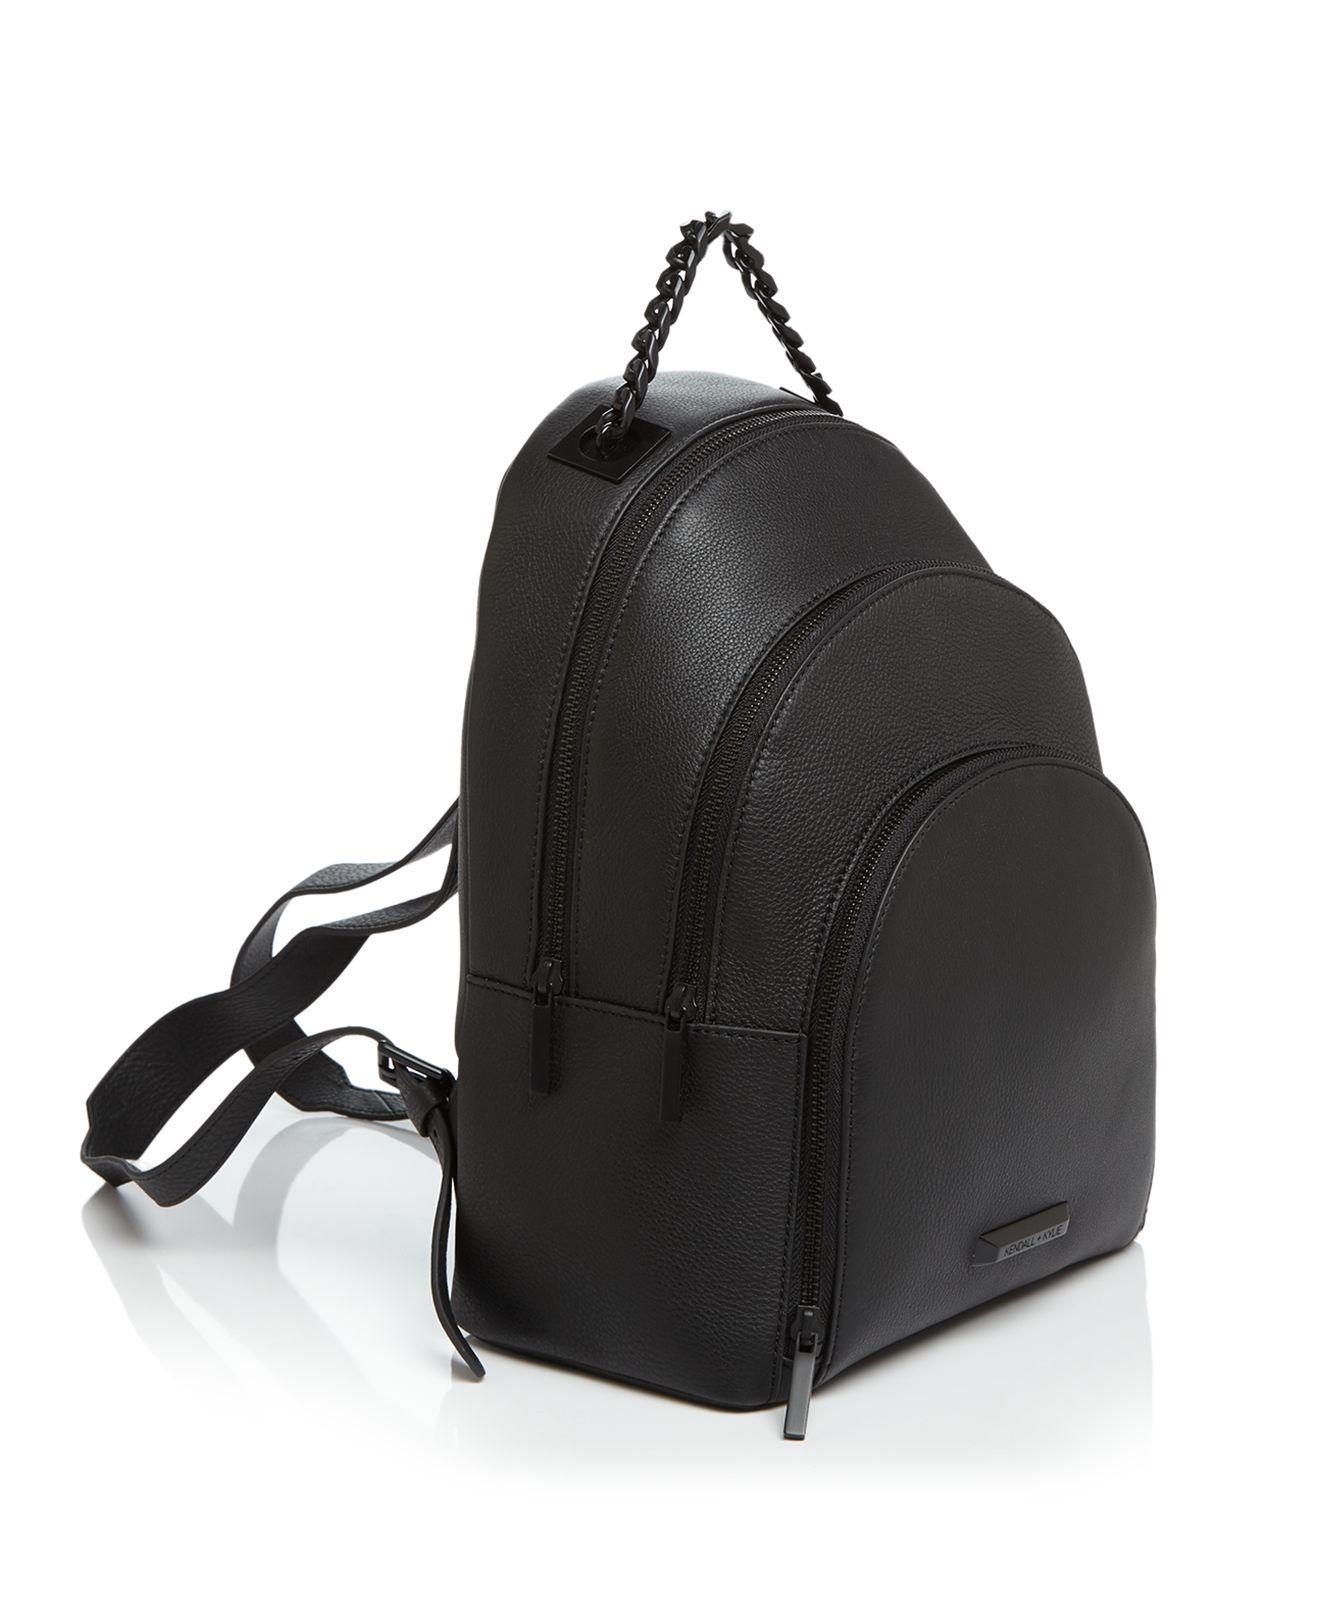 Kendall + Kylie Leather Sloane Backpack in Black/Black (Black)